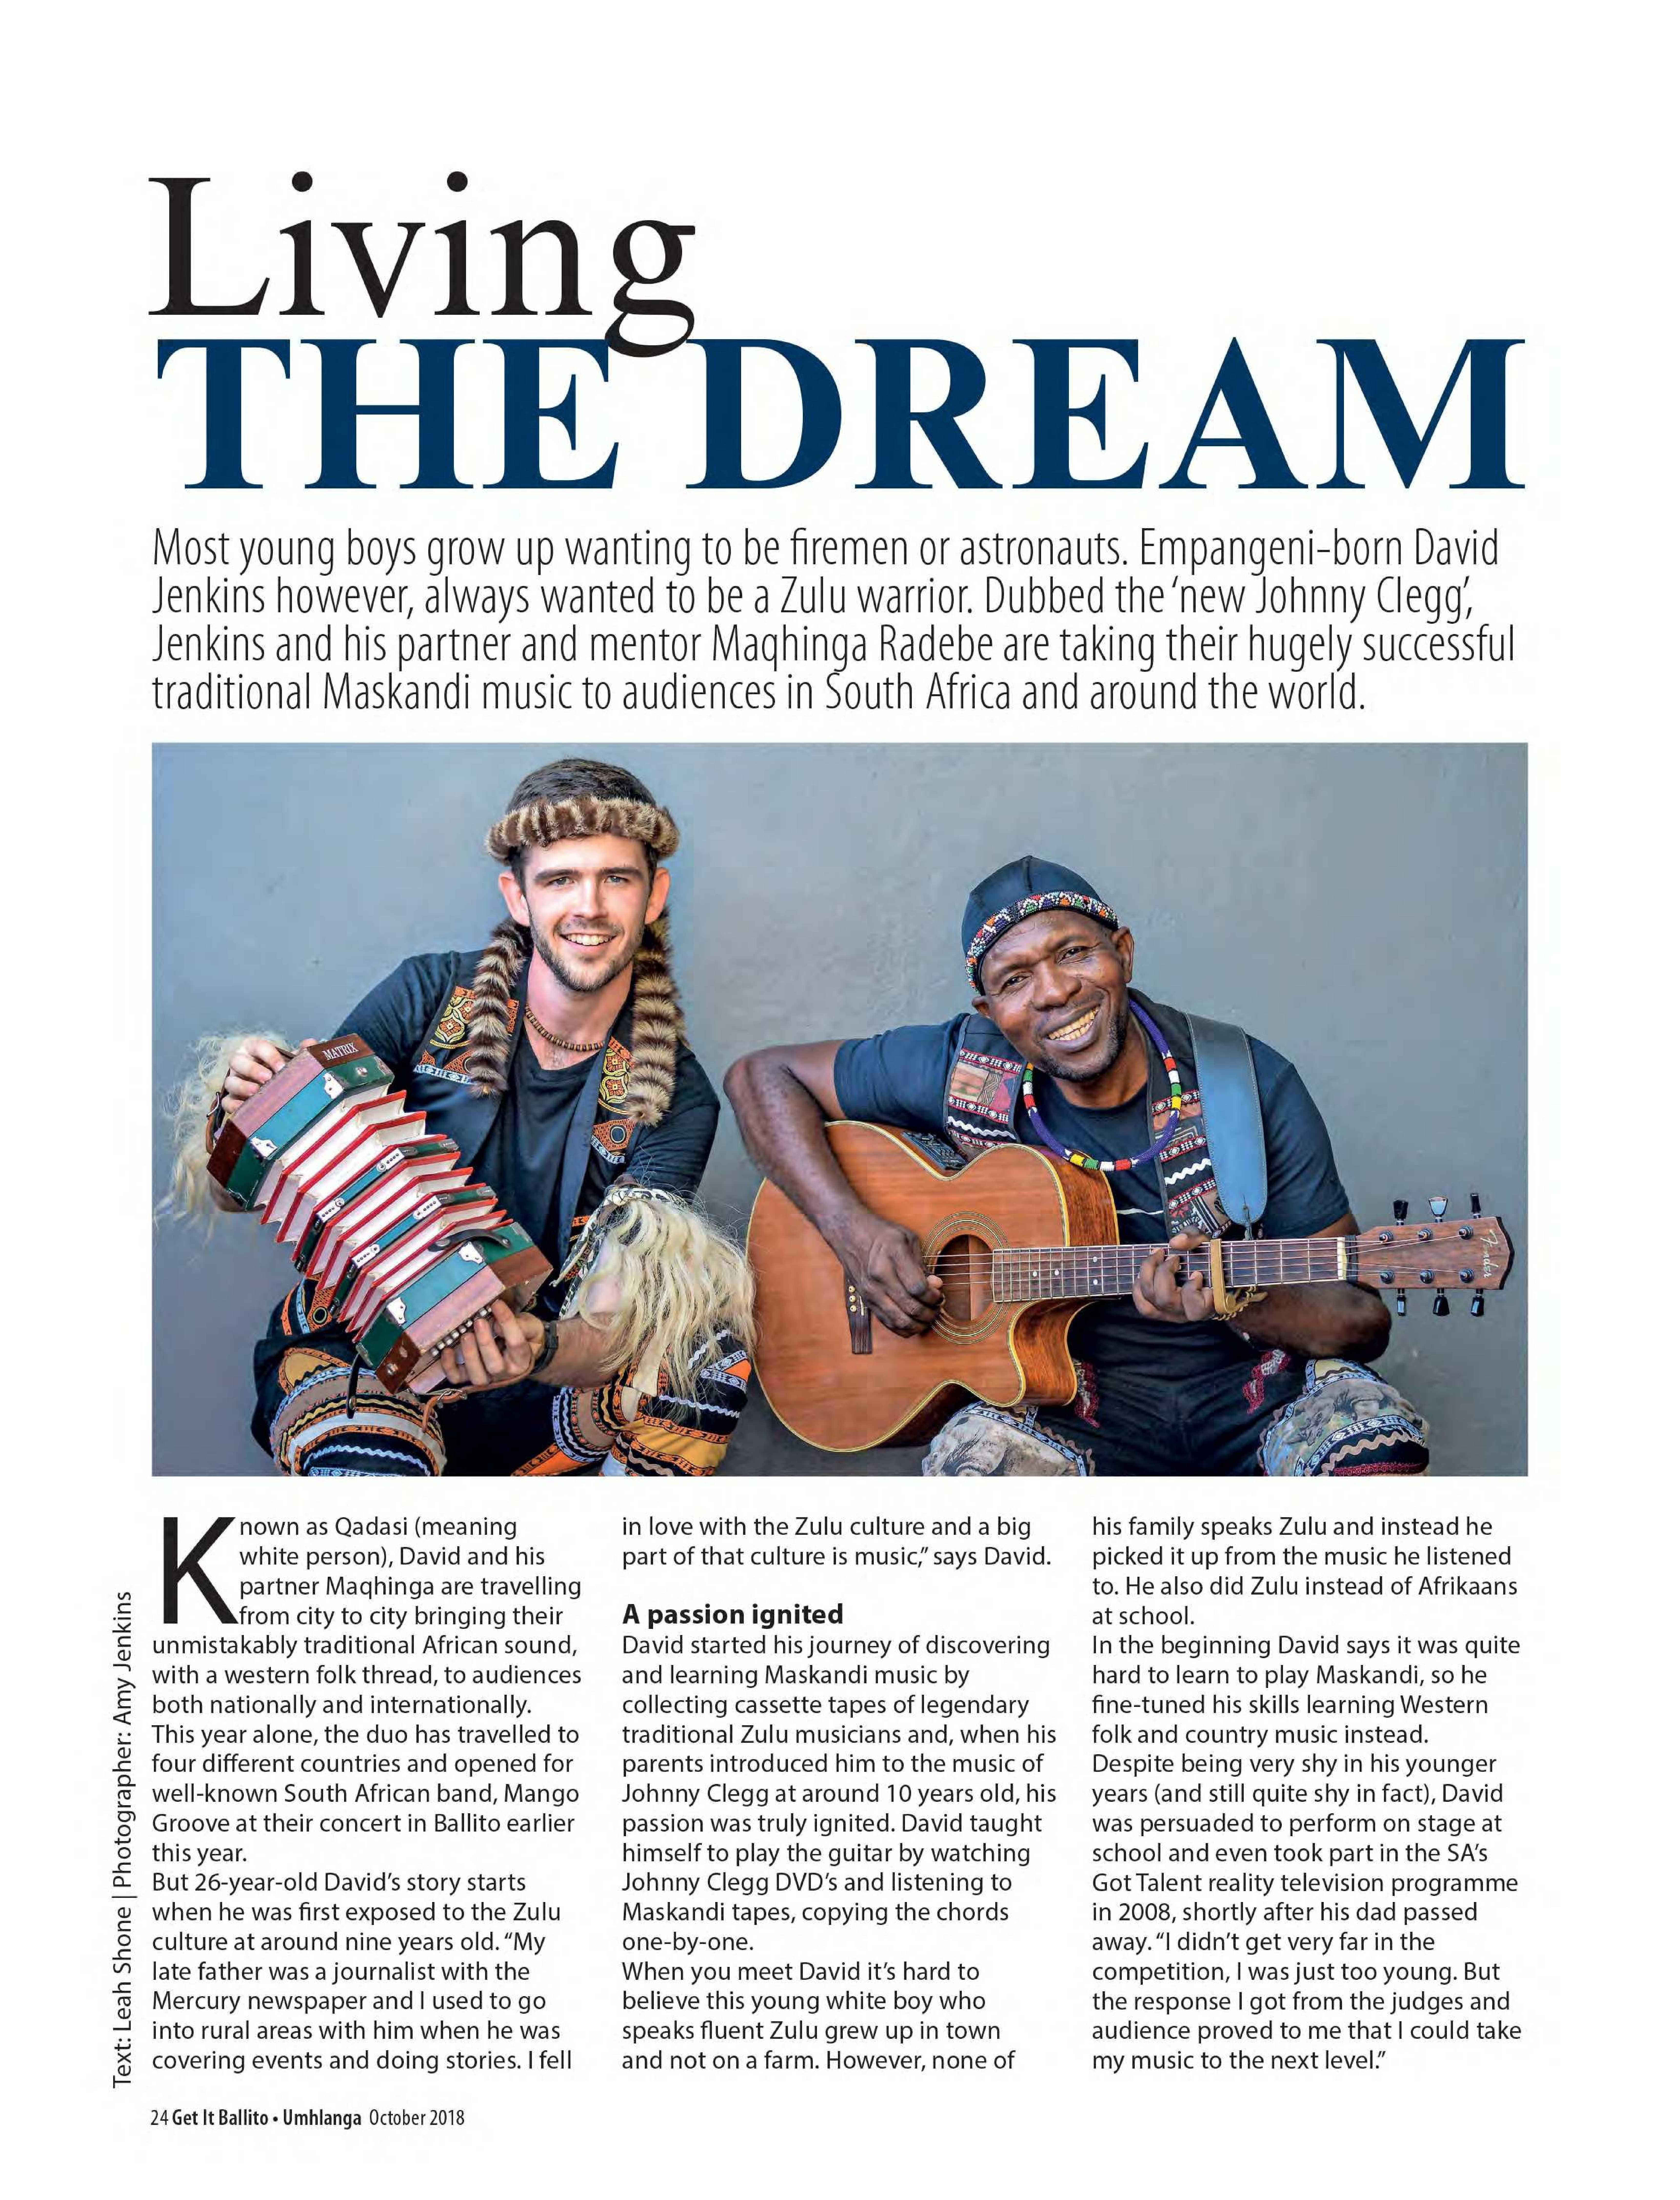 get-magazine-ballitoumhlanga-october-2018-epapers-page-26